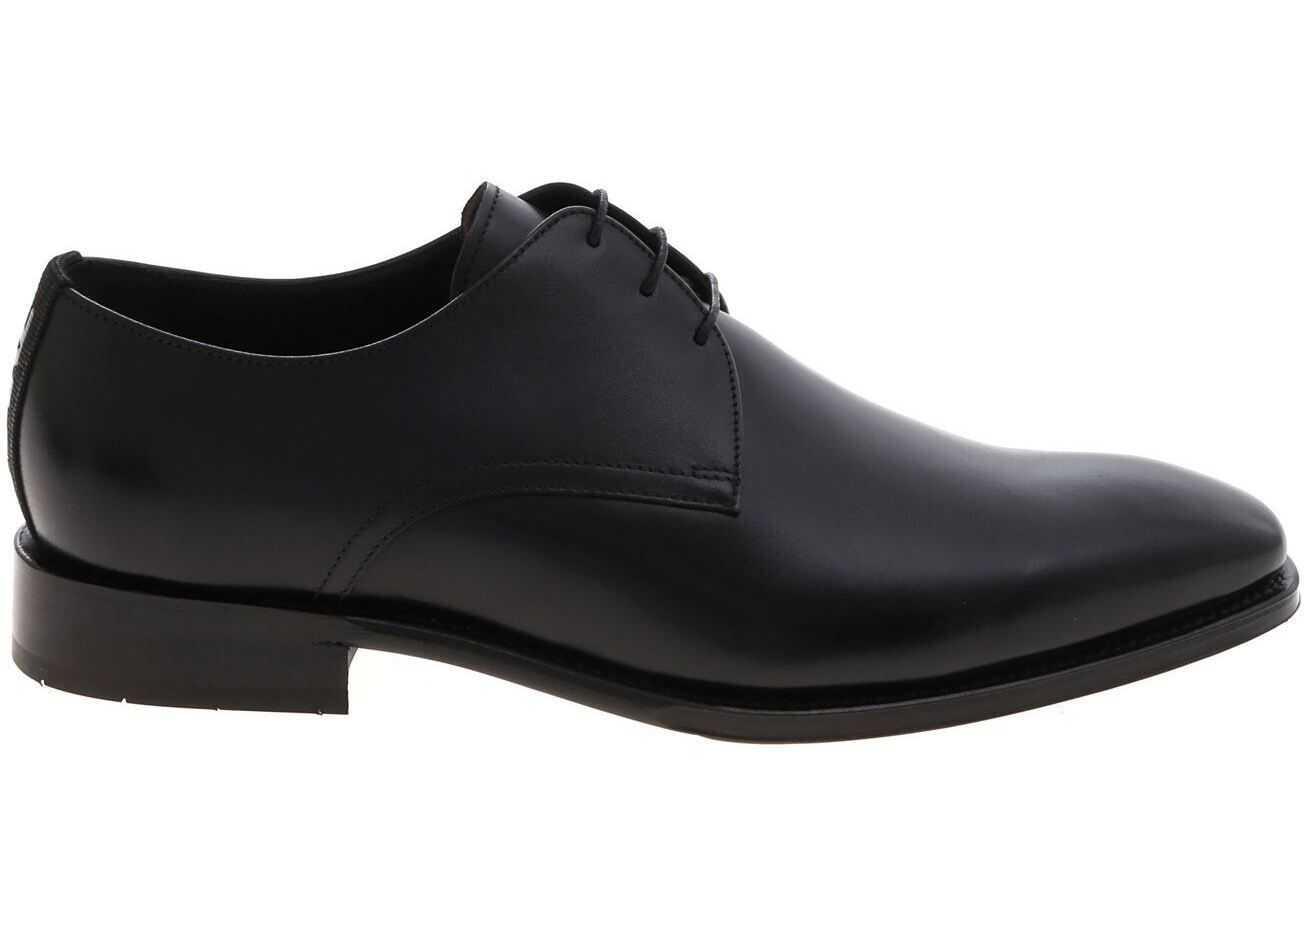 Karl Lagerfeld Mercury Derby Shoes In Black KL12620 000 Black imagine b-mall.ro